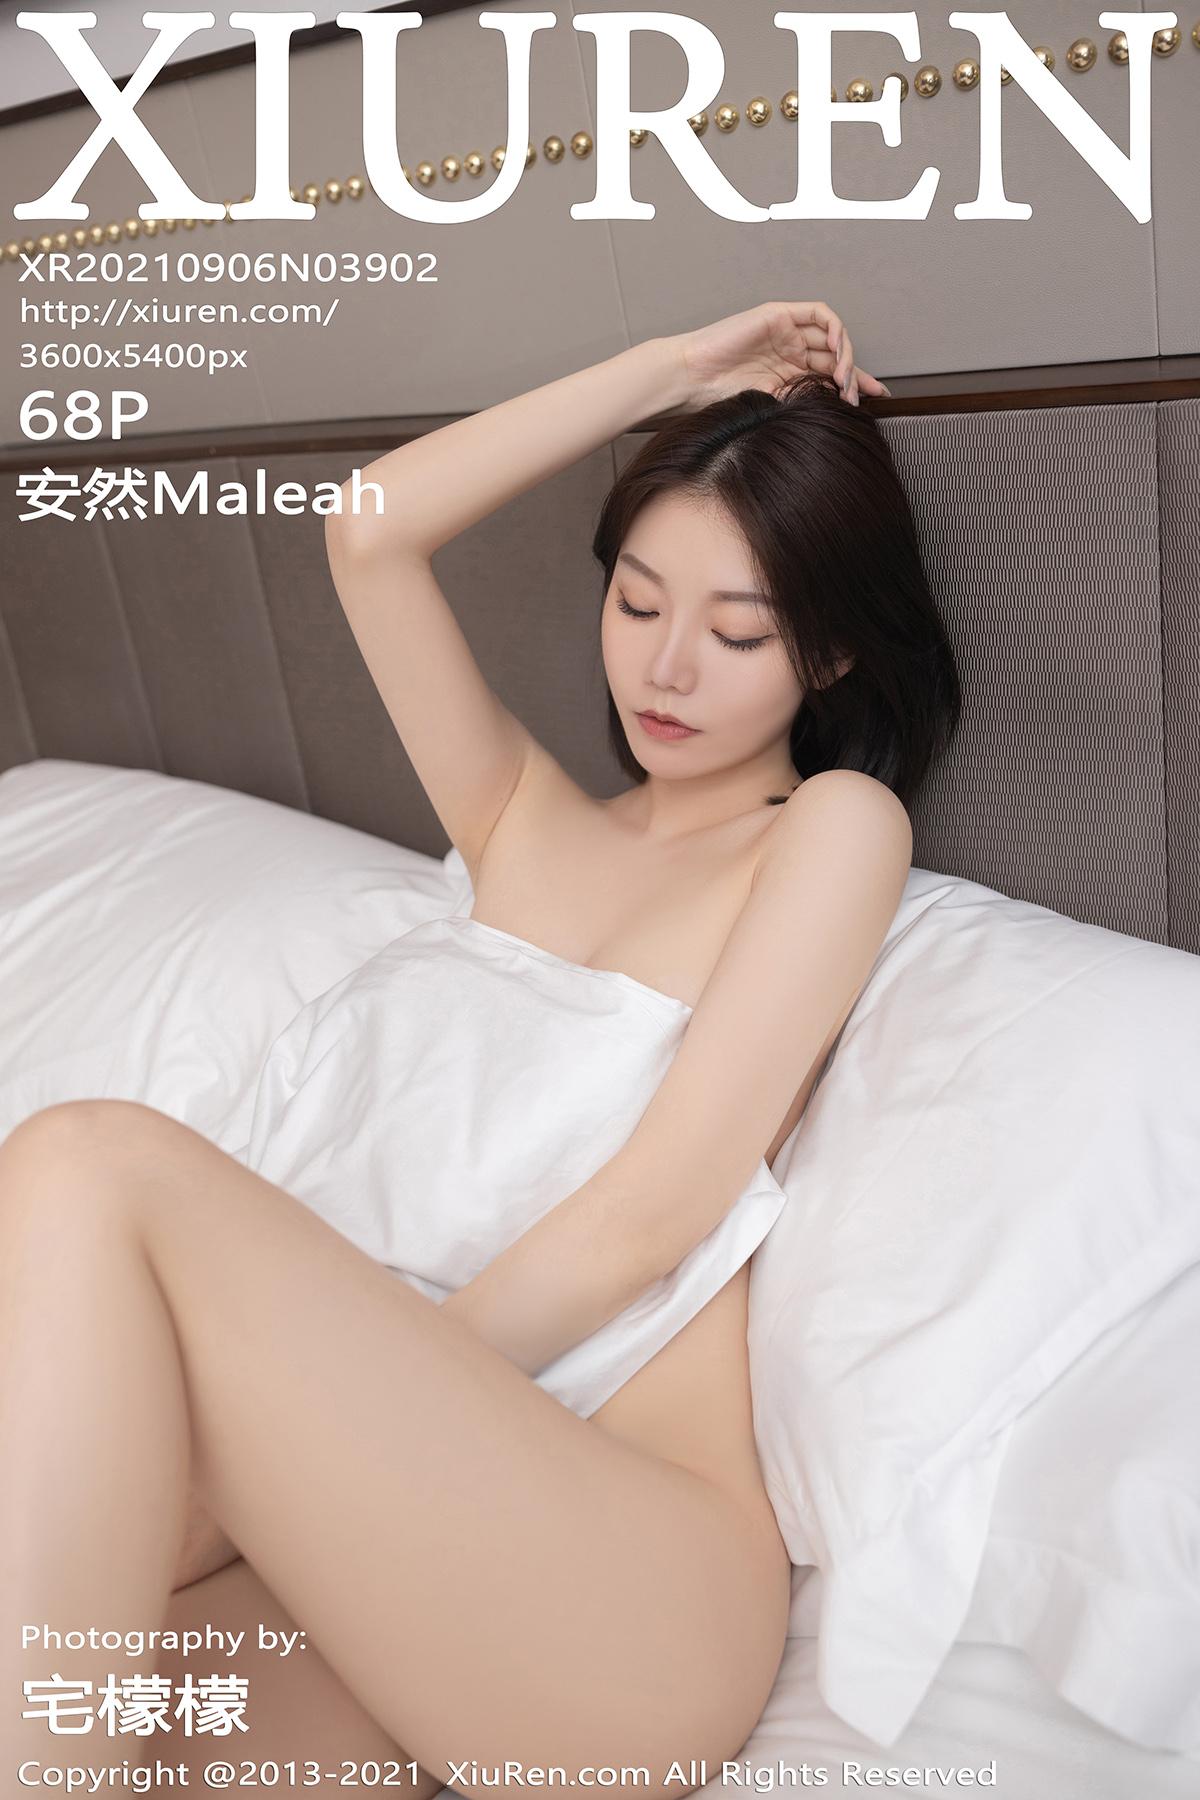 [XiuRen秀人網] 2021.09.06 No.3902 安然Maleah 起床日記主題系列 [68P] - 貼圖 - 清涼寫真 -